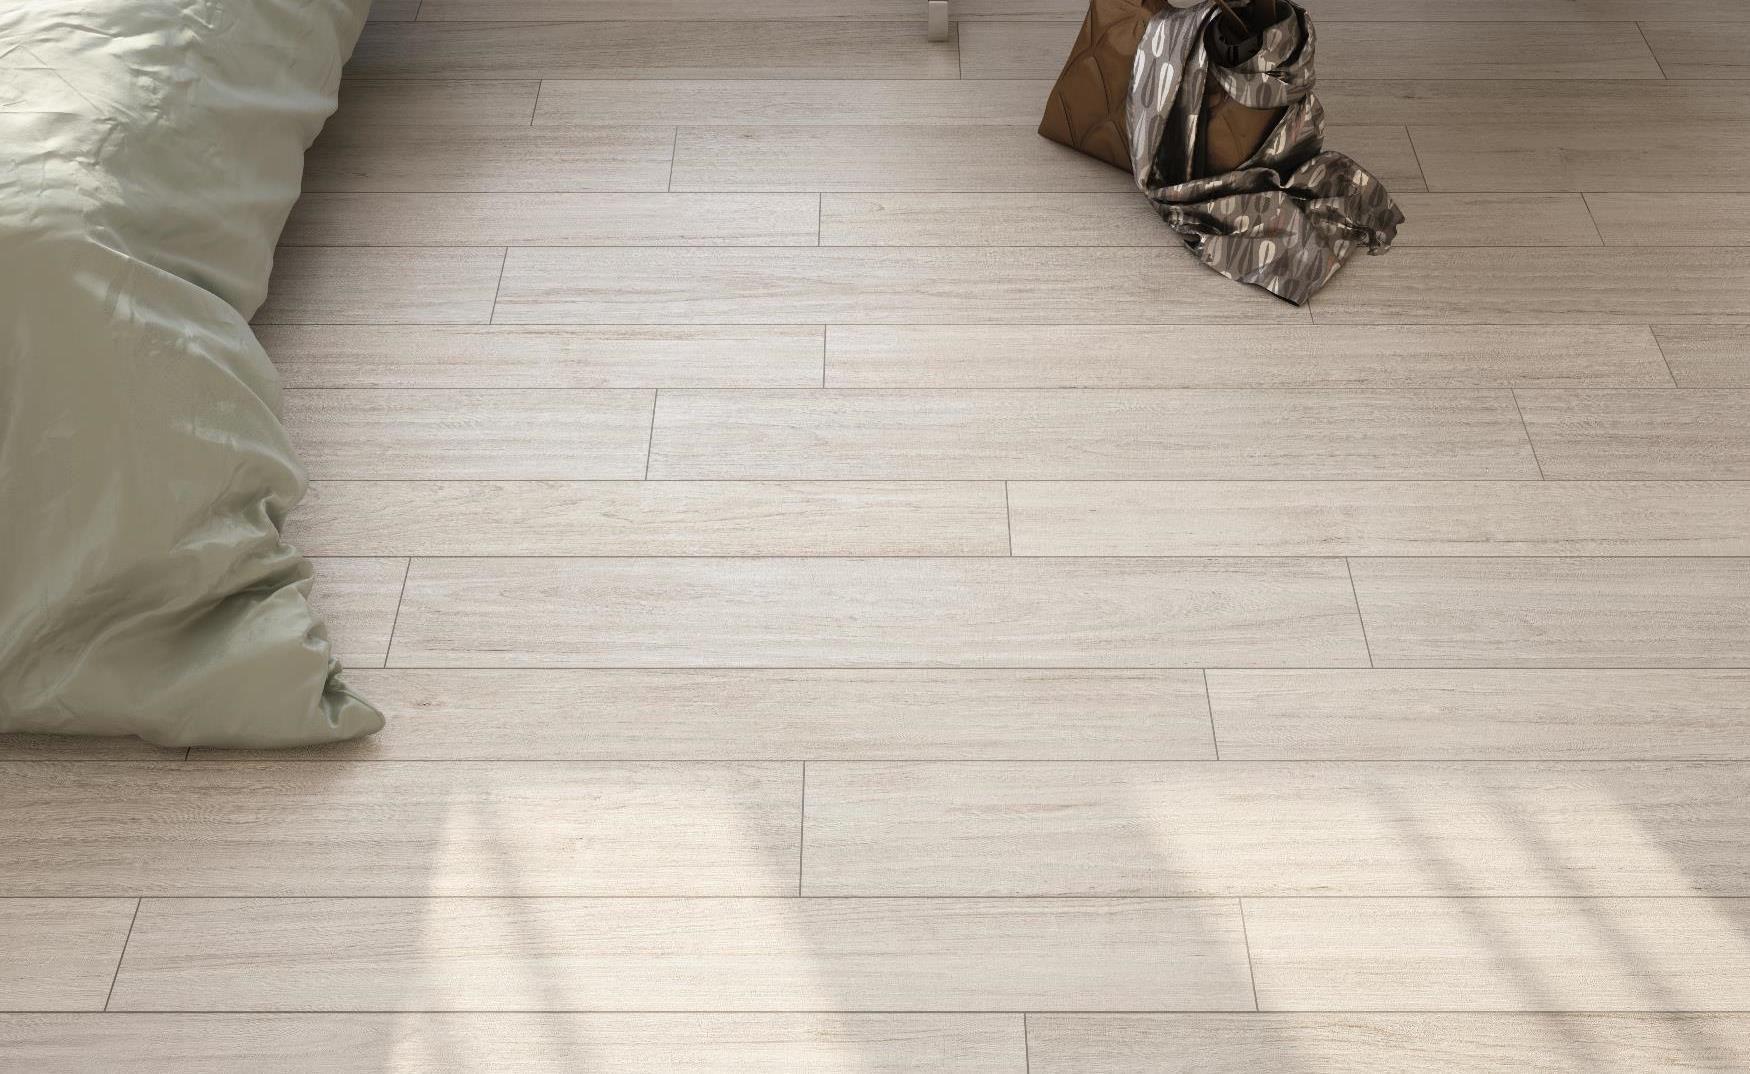 Indoor tile floor porcelain stoneware enameled soft indoor tile floor porcelain stoneware enameled soft sugar dailygadgetfo Choice Image